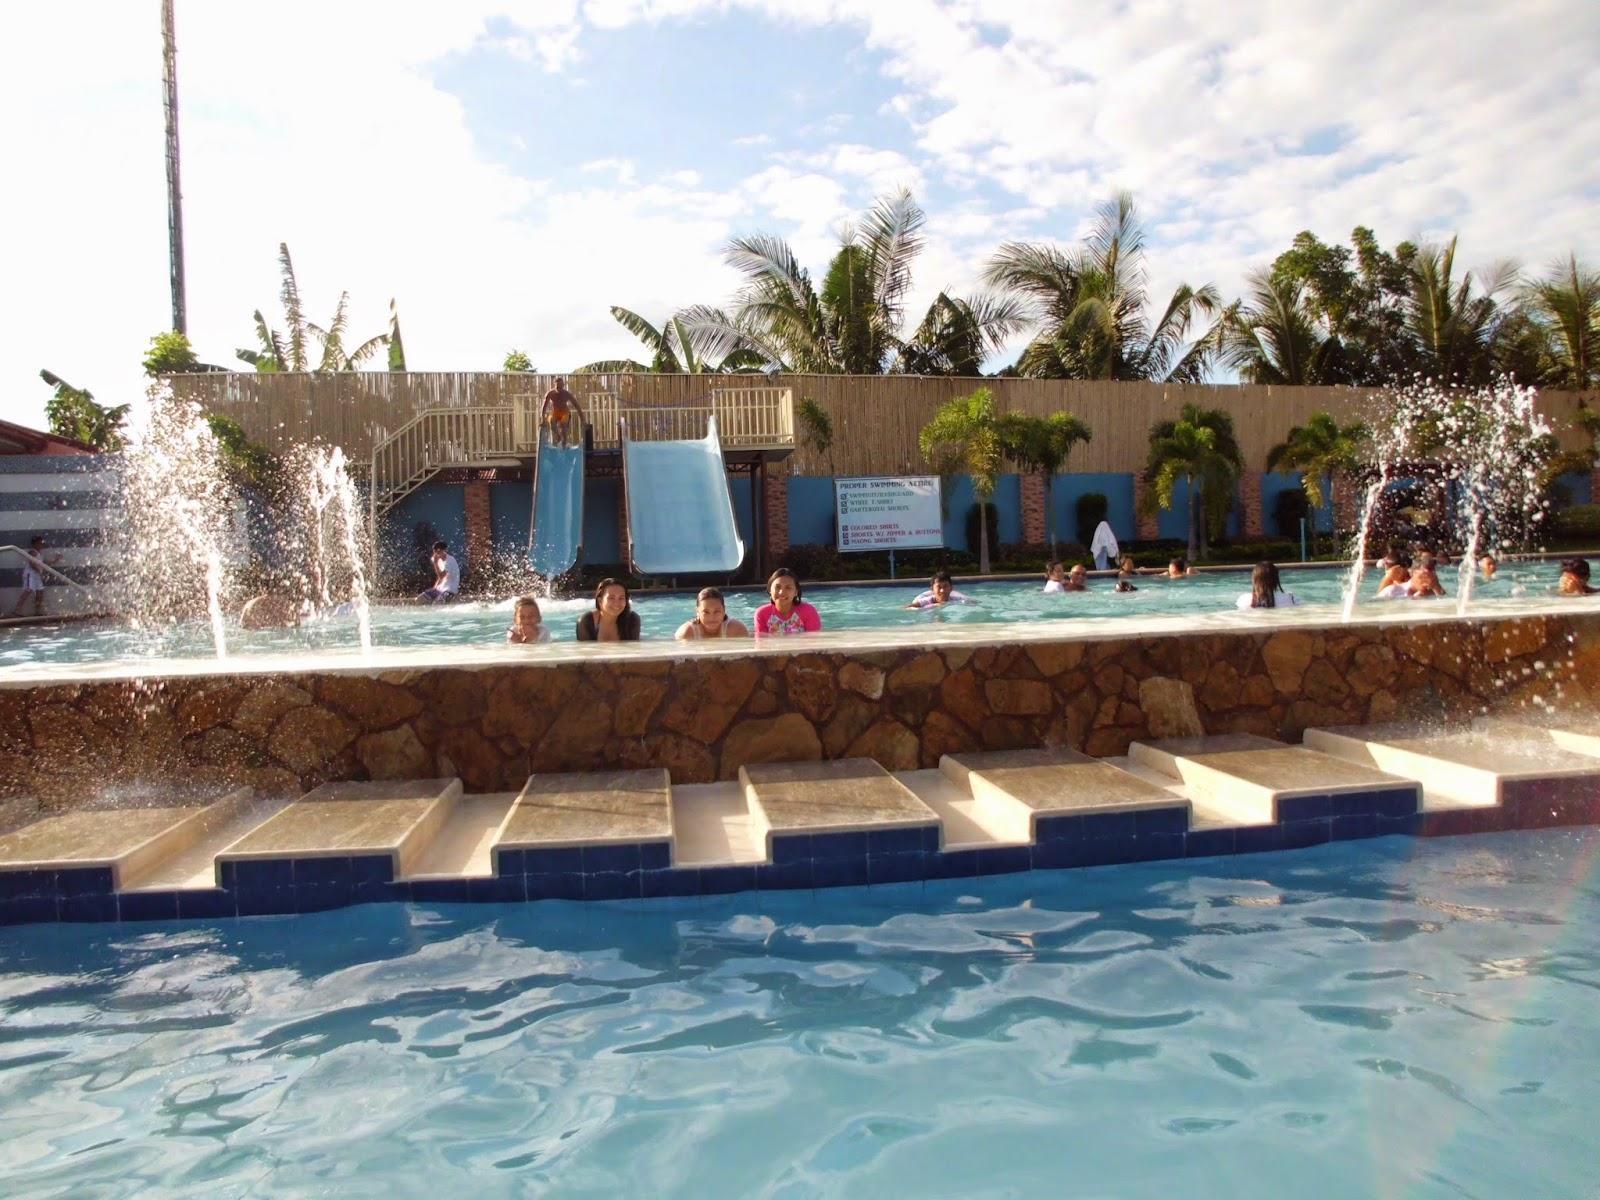 Swimming pool resort in cavite - Beach with swimming pool in cavite ...